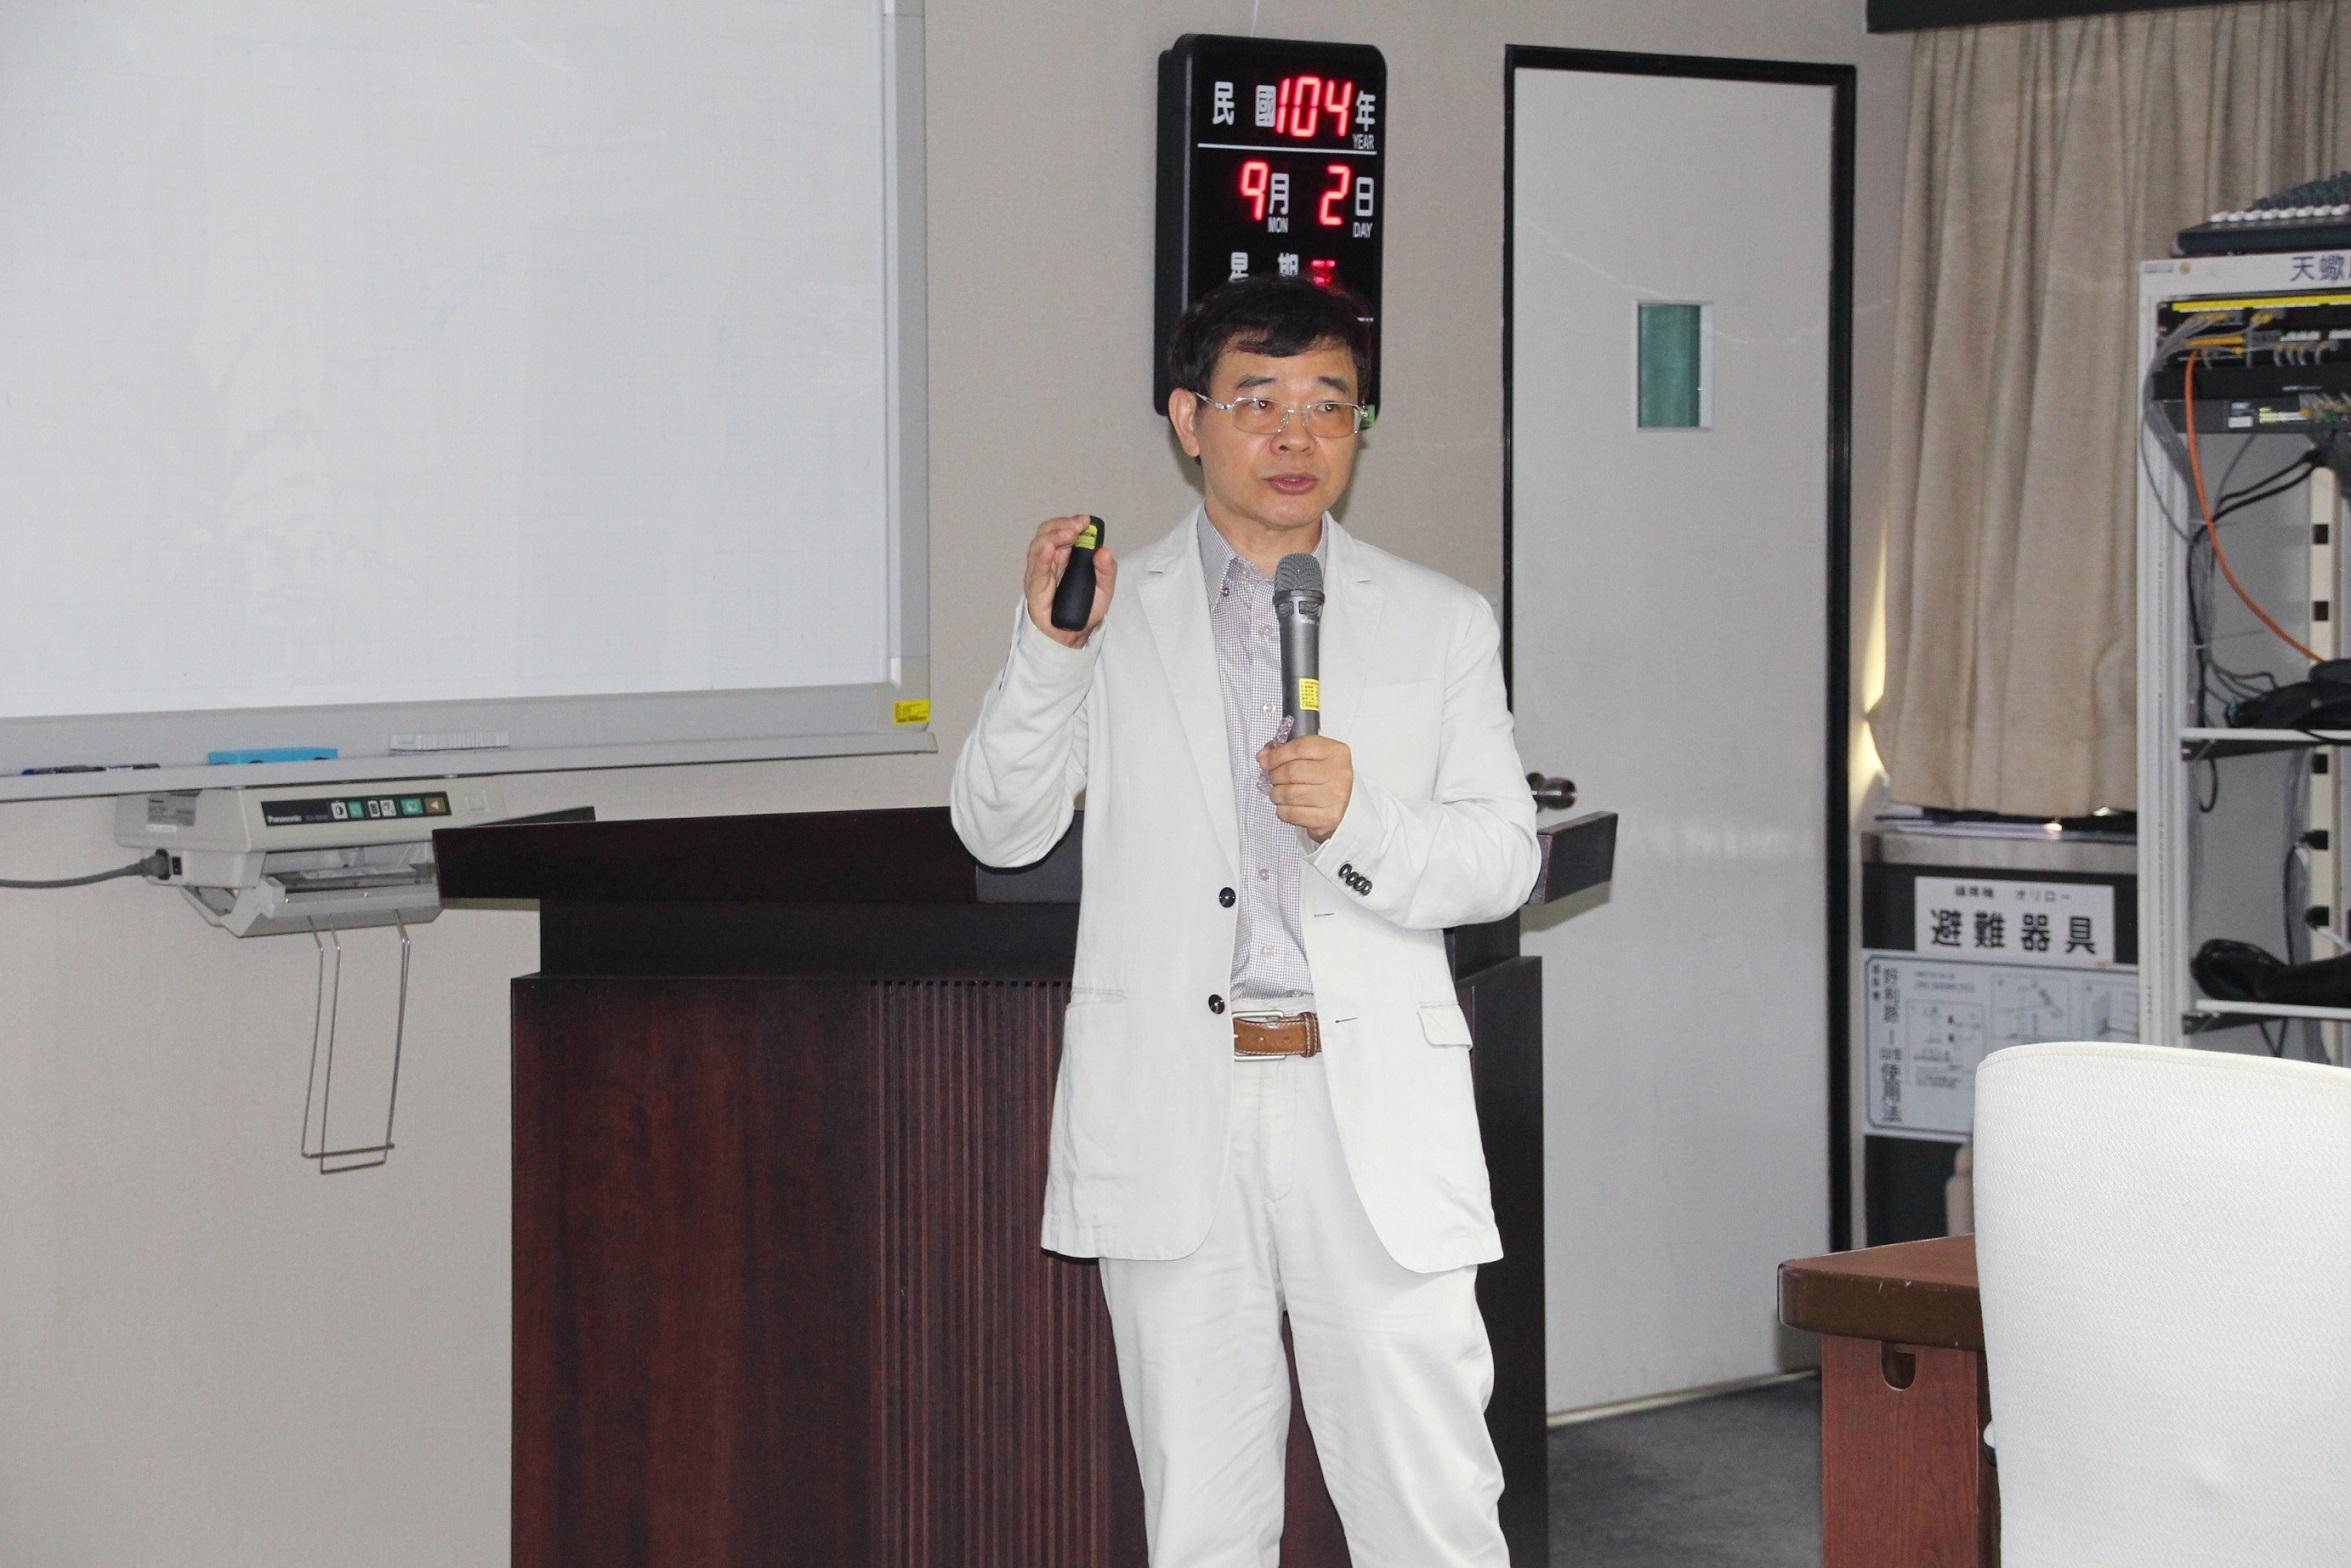 NCHU Professor Lin Kuan-jiuh demonstrates his innovation at the MOST on Thursday.